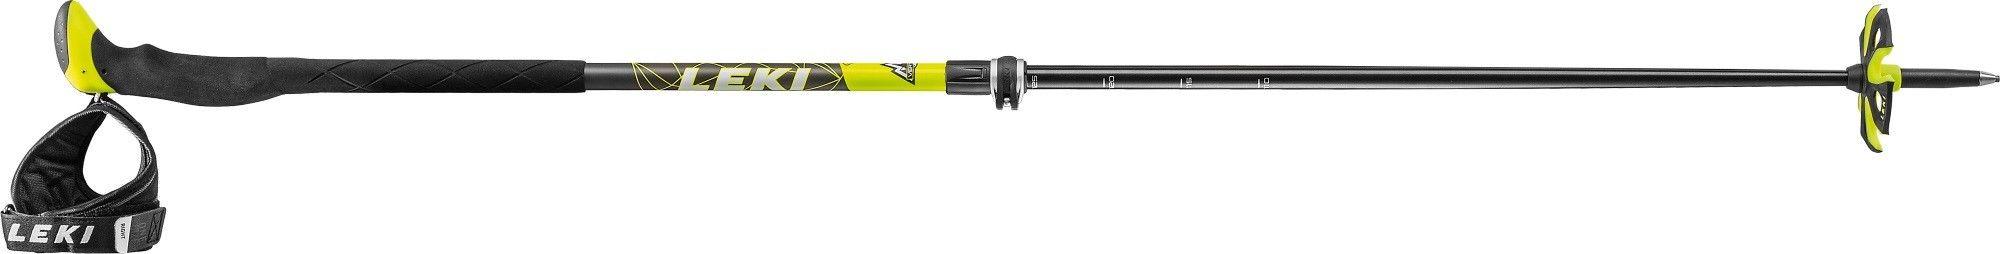 Leki Aergon 2 V | Größe 110 - 150 cm |  Ski- & Tourenstock